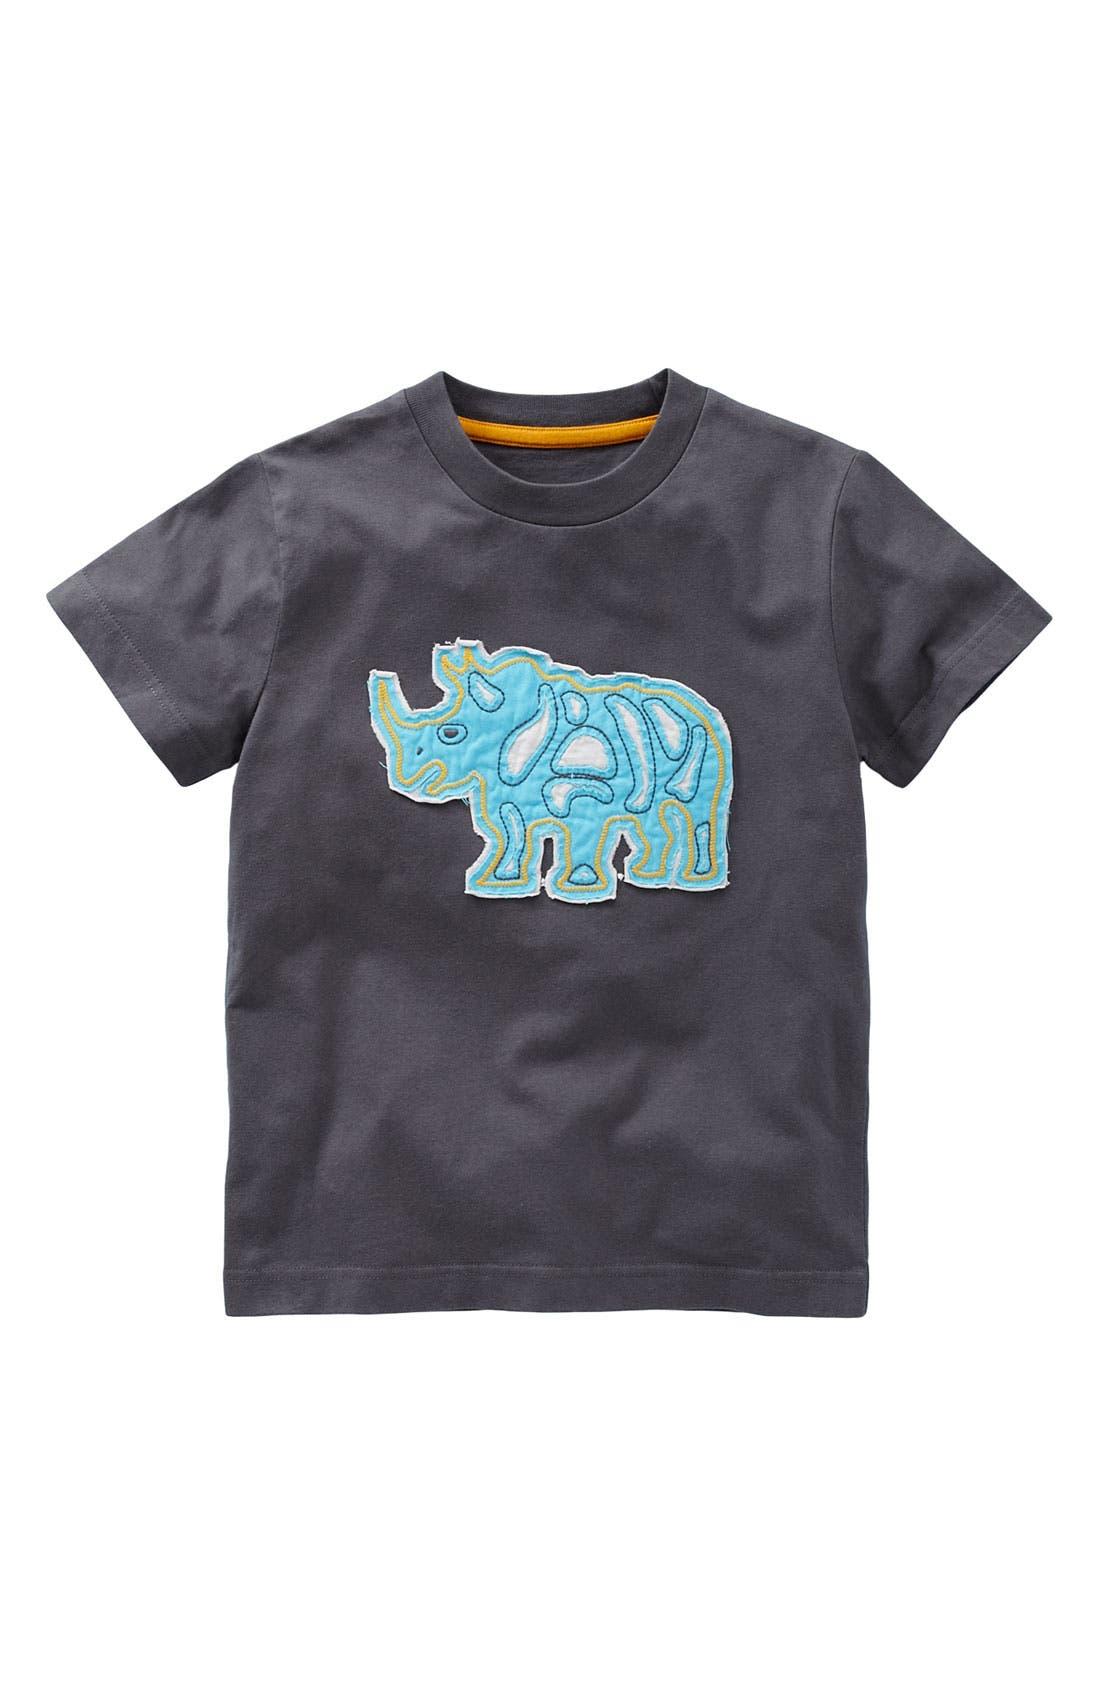 Alternate Image 1 Selected - Mini Boden 'Rough' Appliqué T-Shirt (Big Boys)